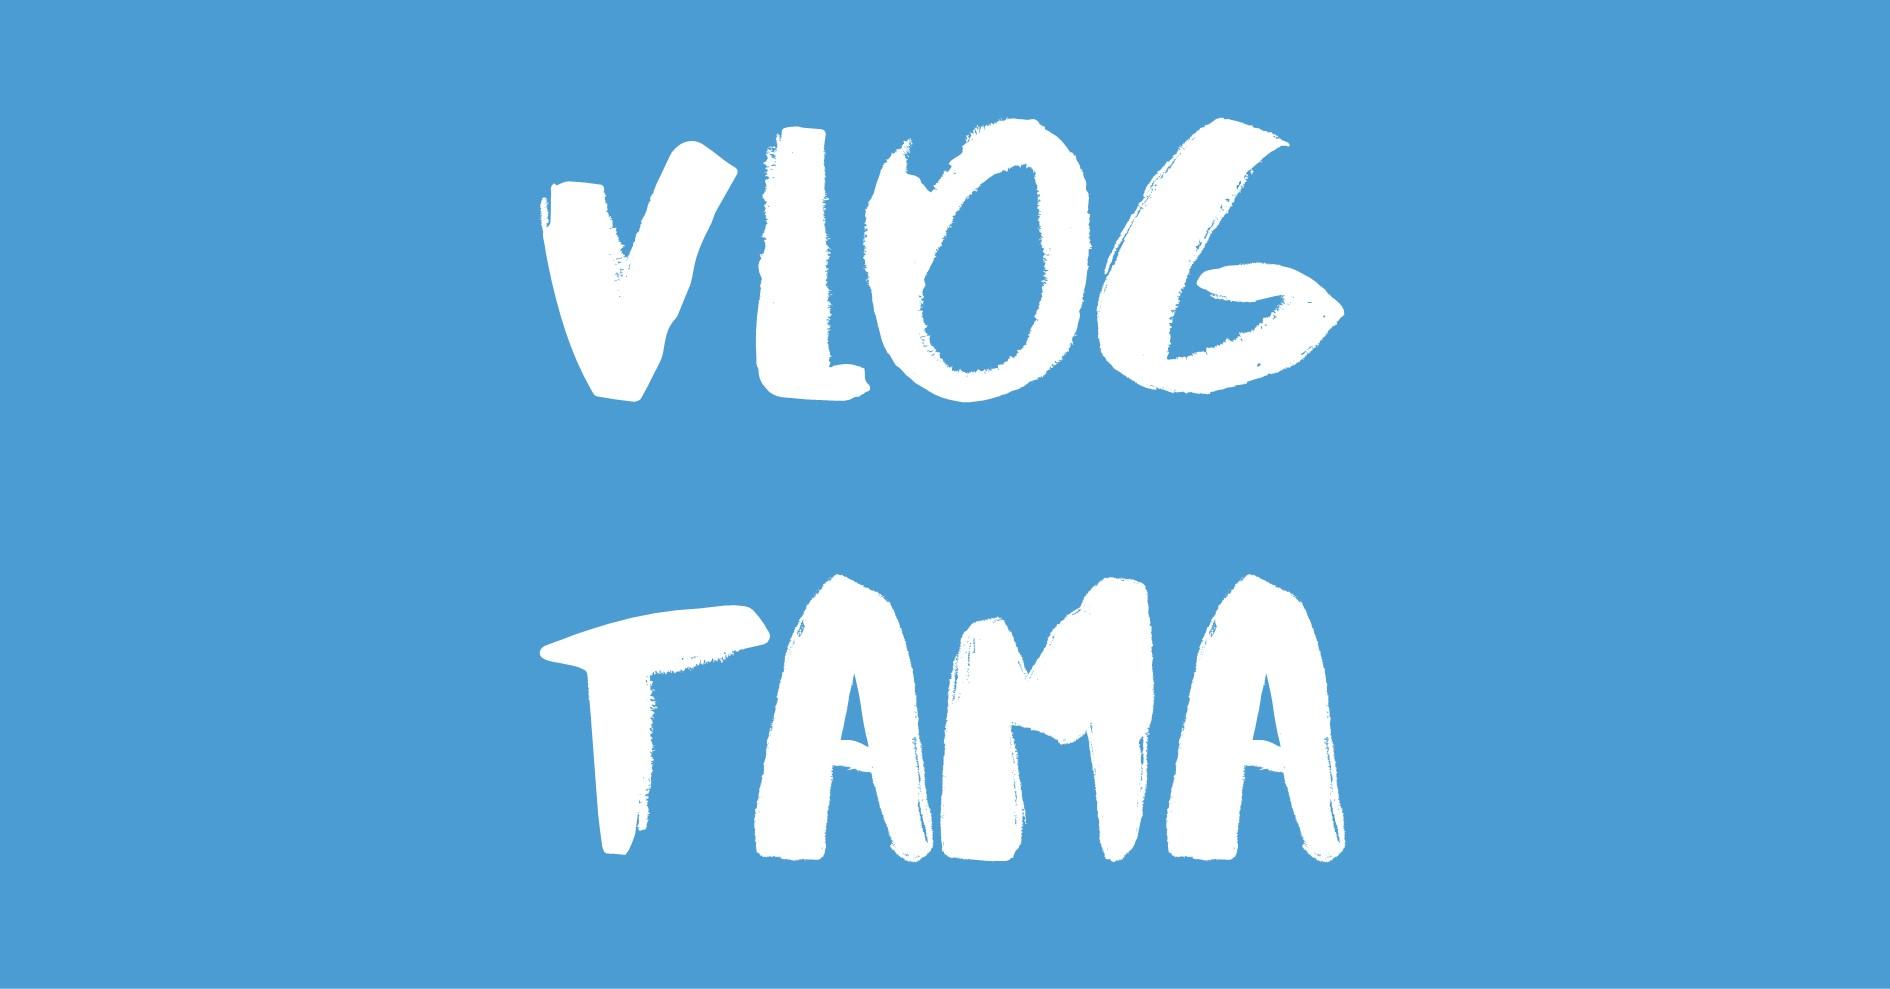 [Vlog] 多摩市周辺エリア / Tama